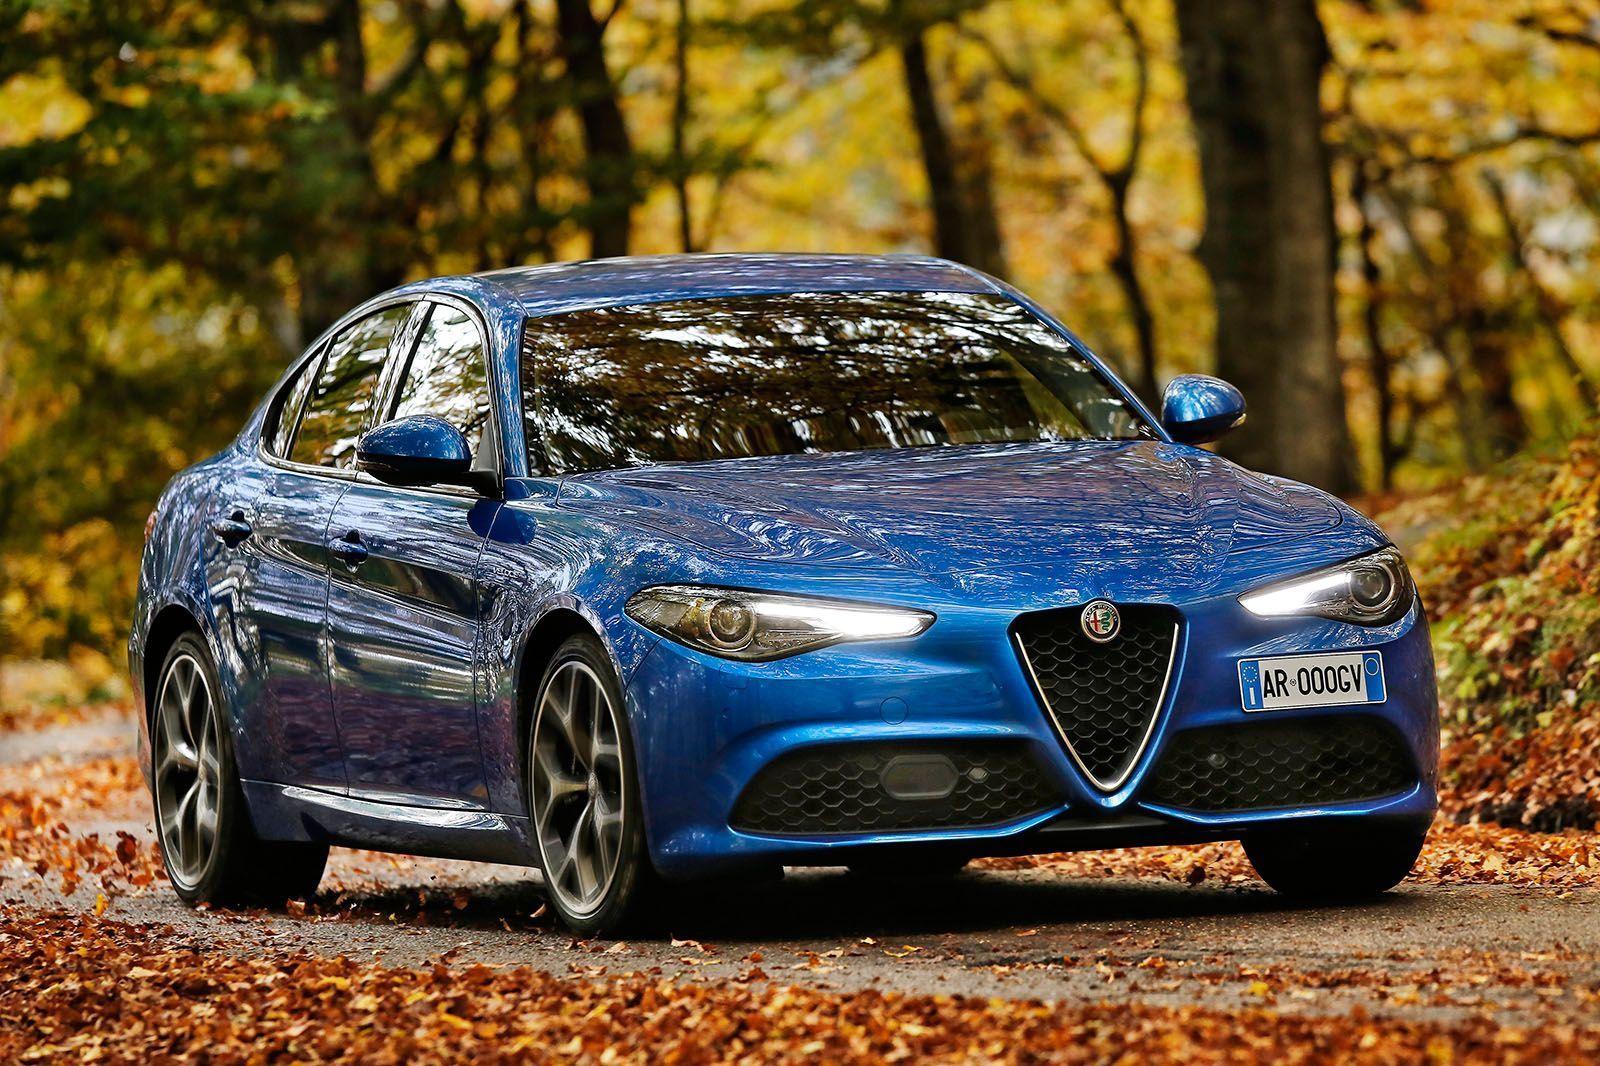 2017 Alfa Romeo Giulia Veloce Review Review Autocar Alfa Romeo Alfa Romeo Giulia Alfa Romeo Cars